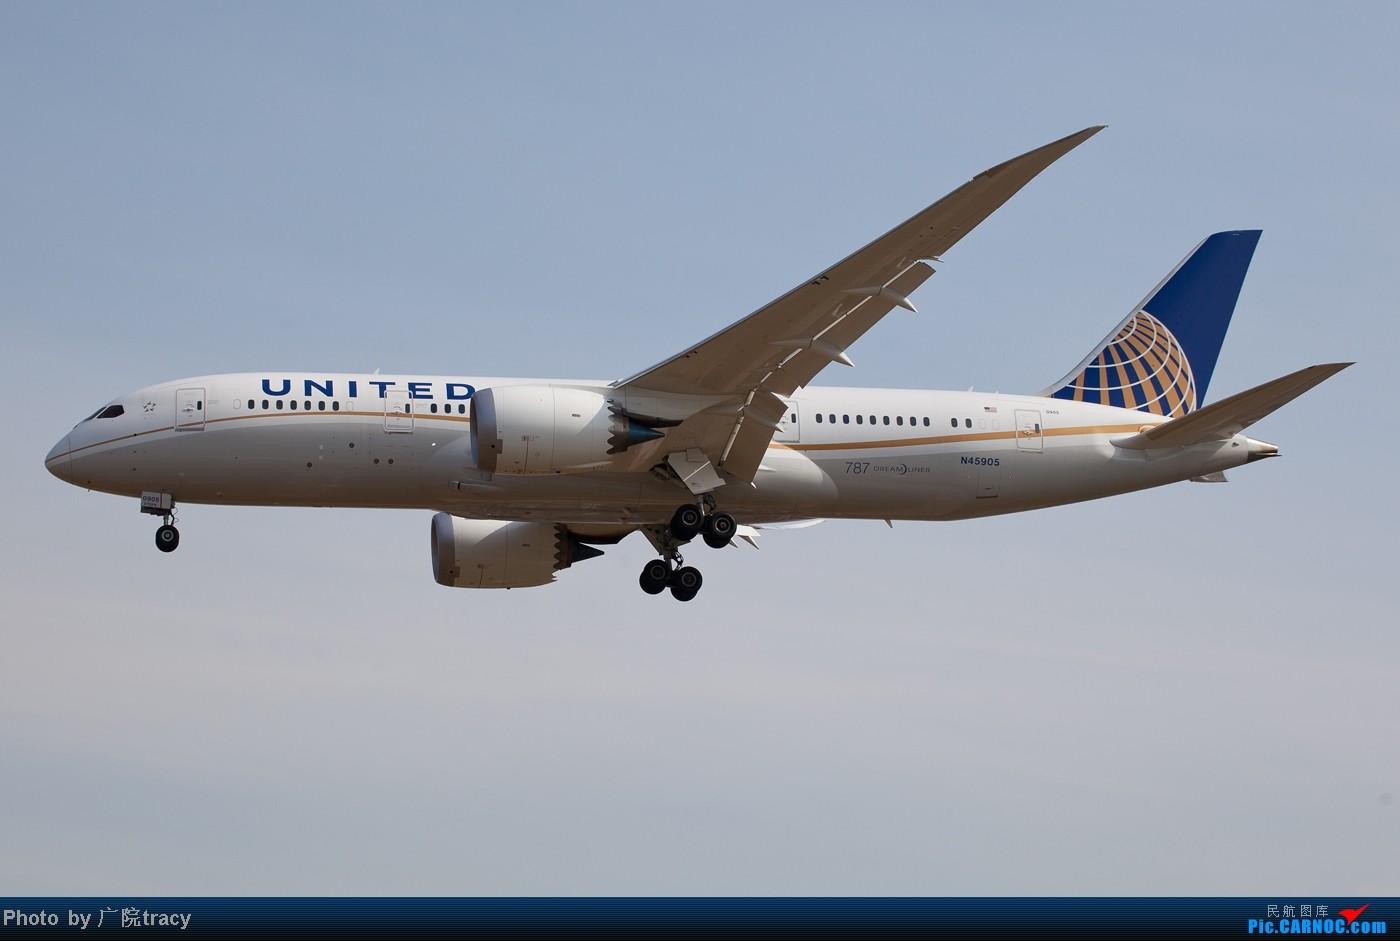 Re:[原创]★ ★ ★ ★ ★目前已经拍到了9家航空公司的波音787梦想客机★ ★ ★ ★ ★ BOEING 787-8 N45905 英国伦敦希思罗机场